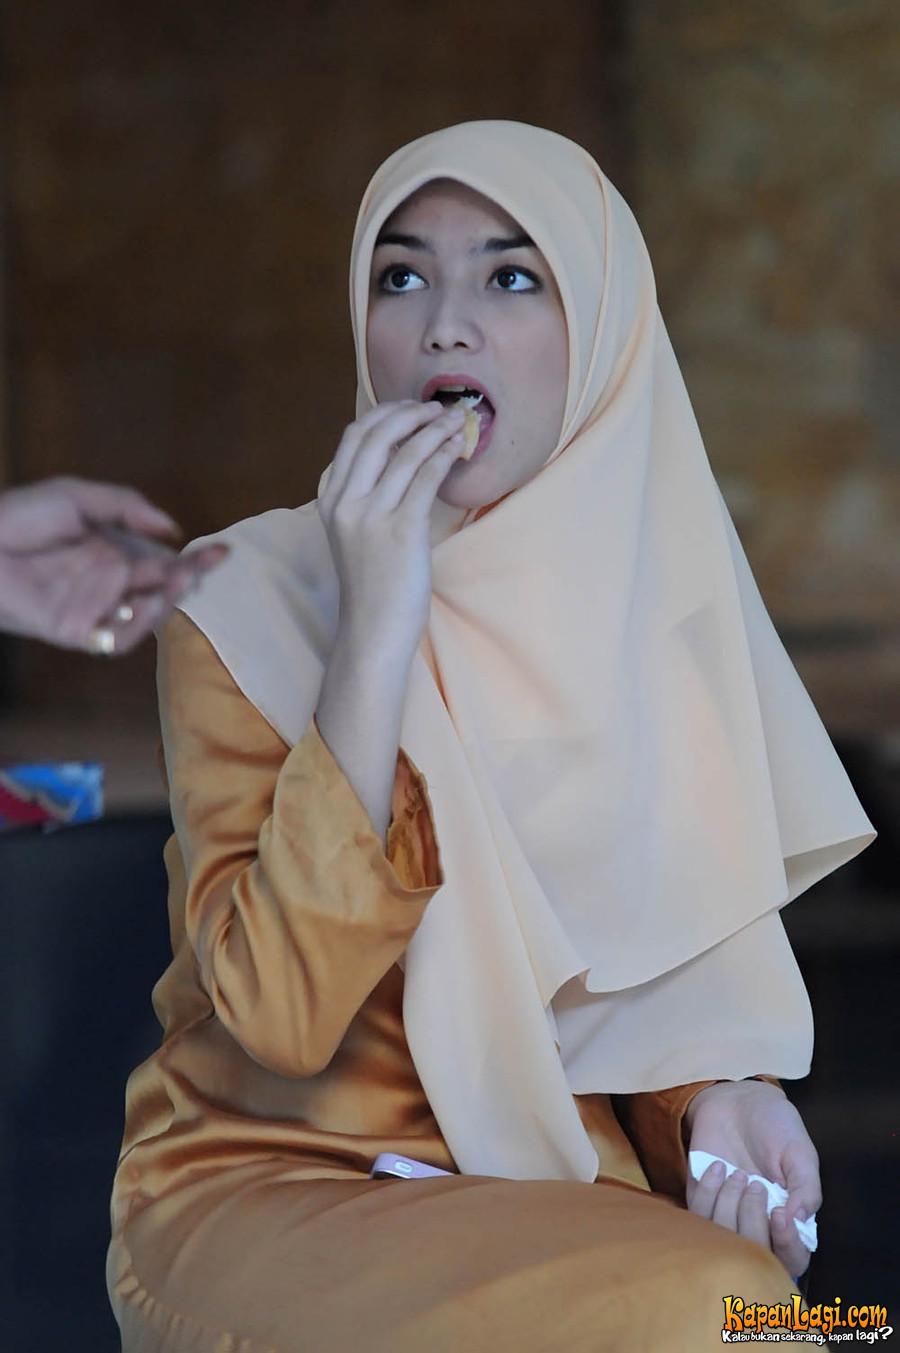 ... foto remaja bugil 10 indo3gpbokep 1 jembut meki anak anak 1 foto